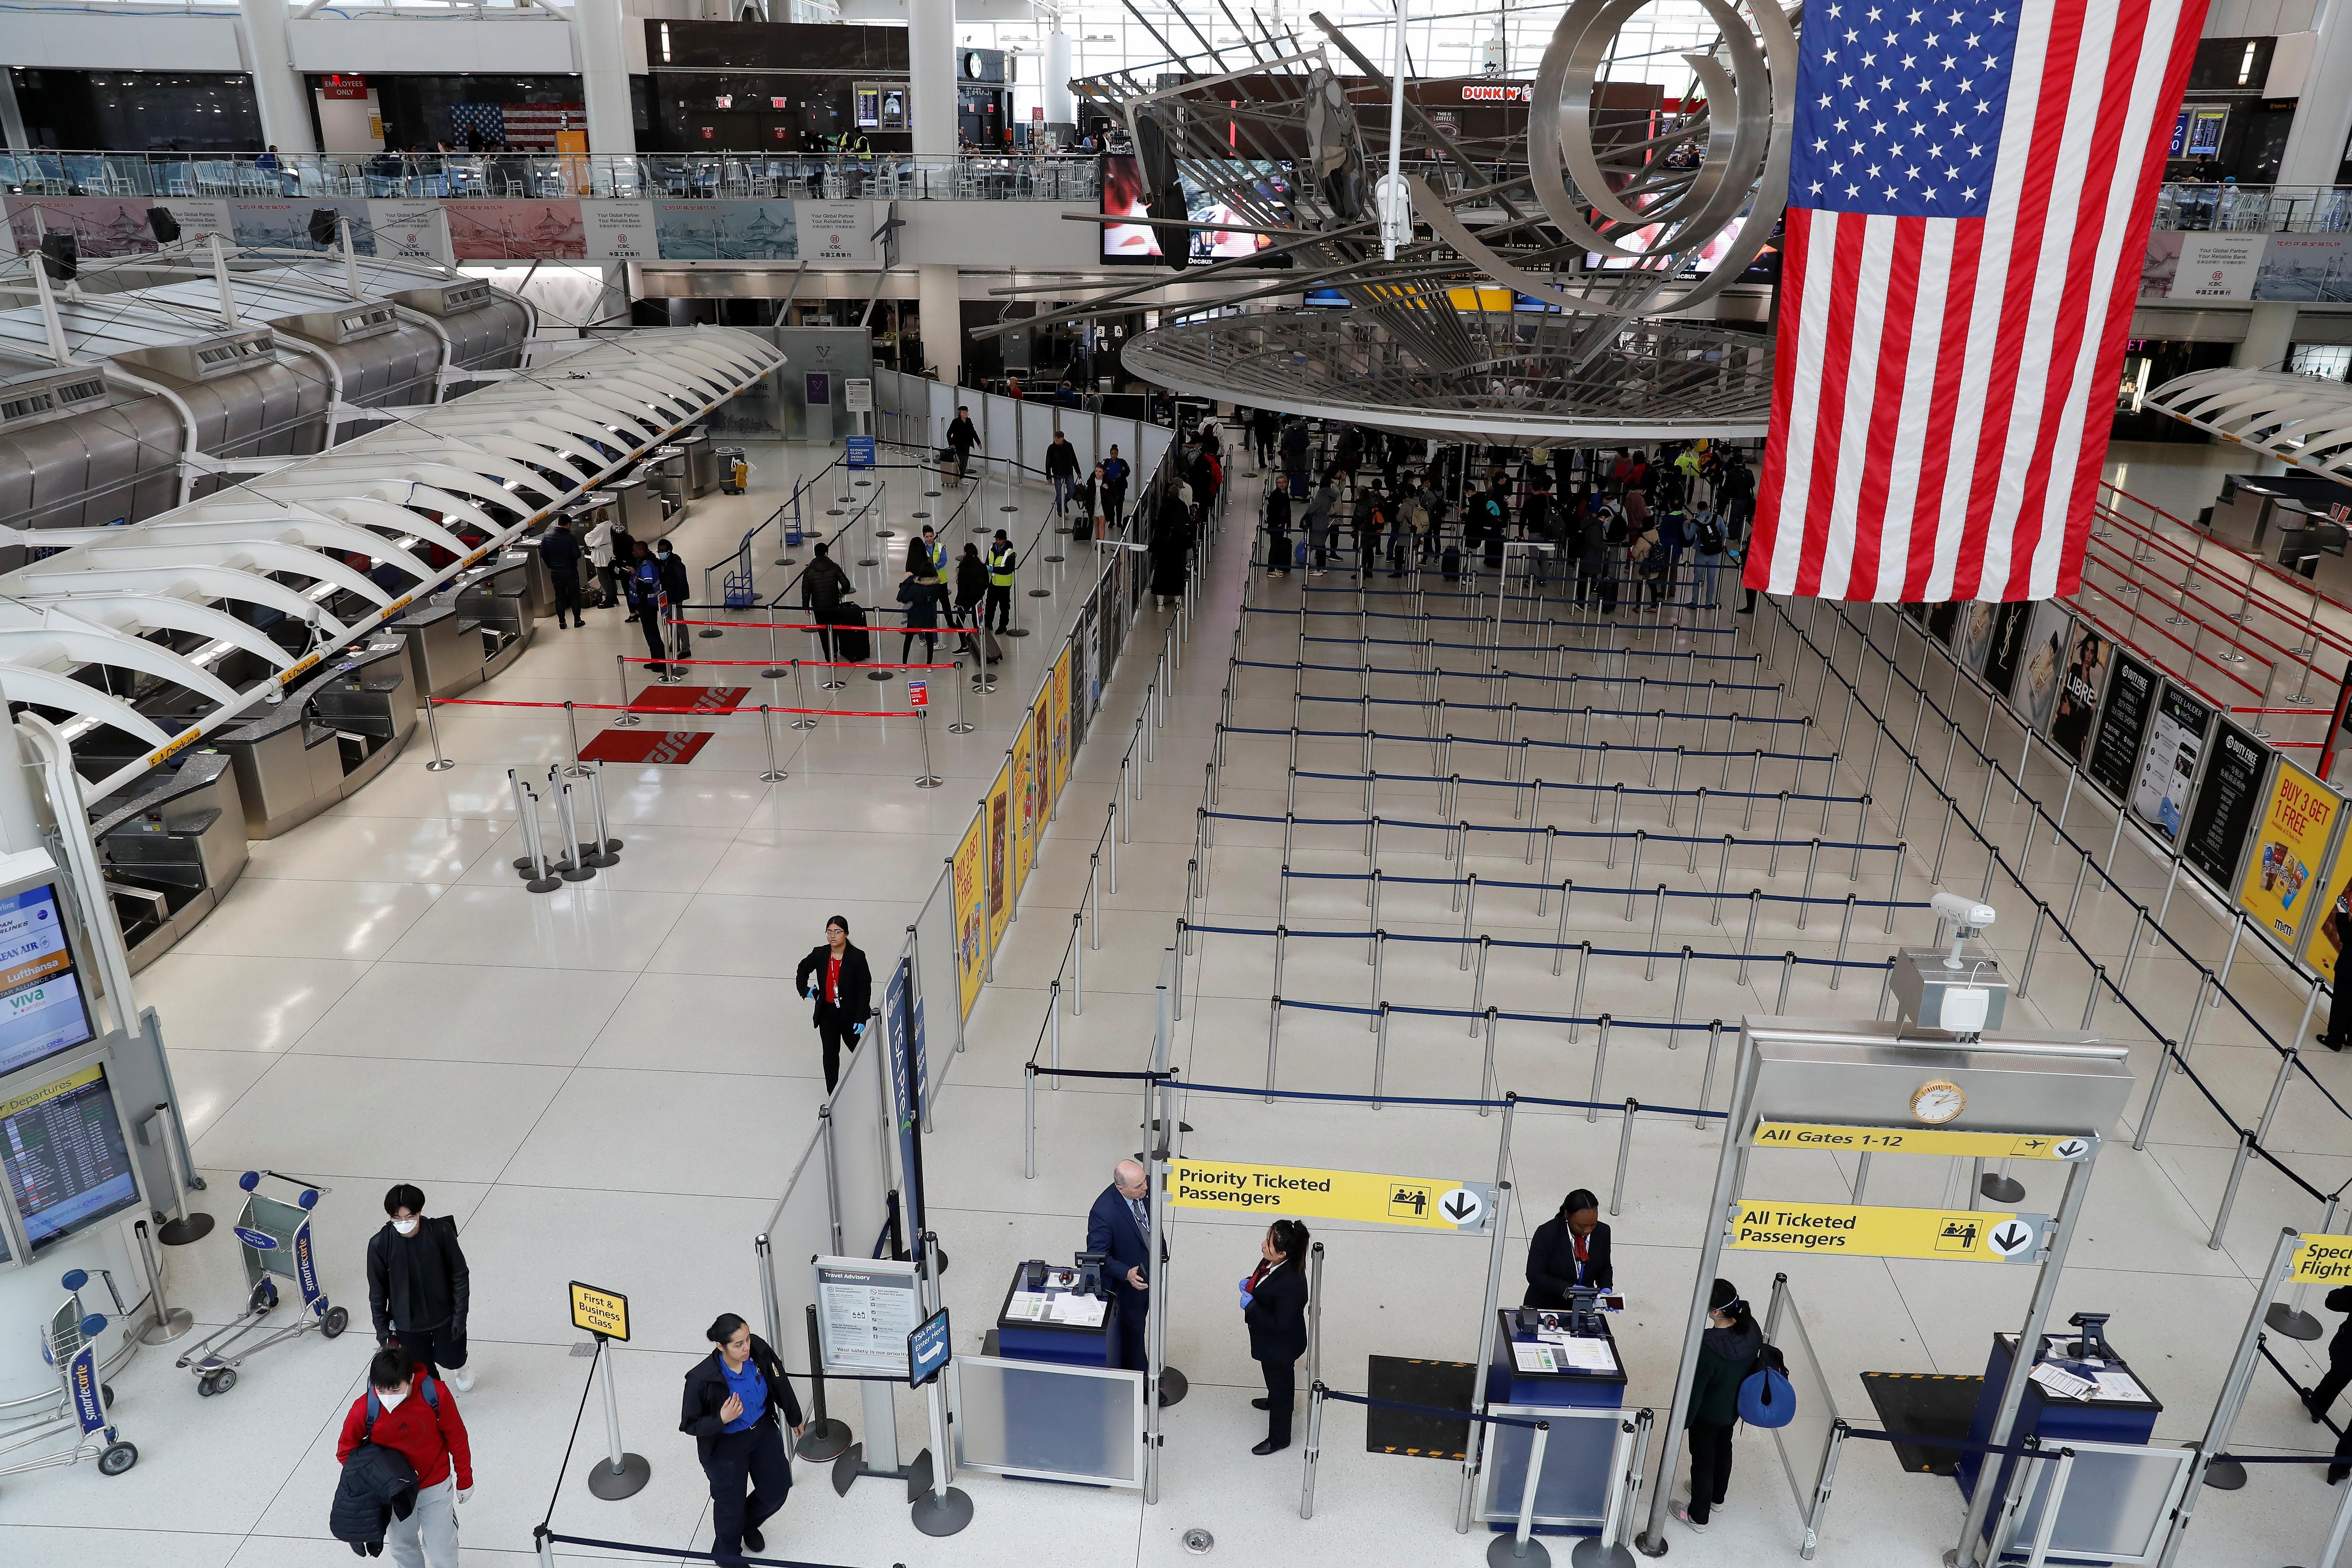 Biden to block Trump's plan to lift travel bans